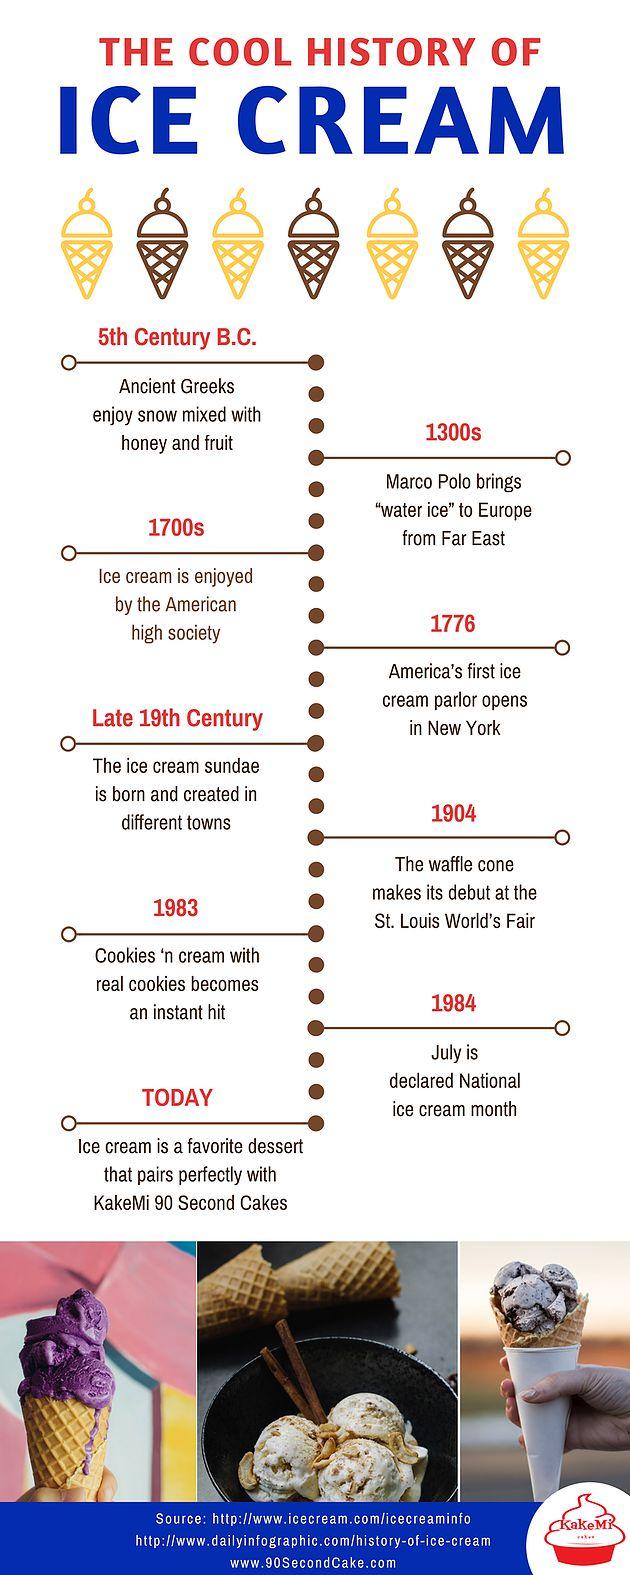 The Cool History of Ice Cream | 90 Second Cake | Microwave Cake | KakeMi (Cake Me) Cakes